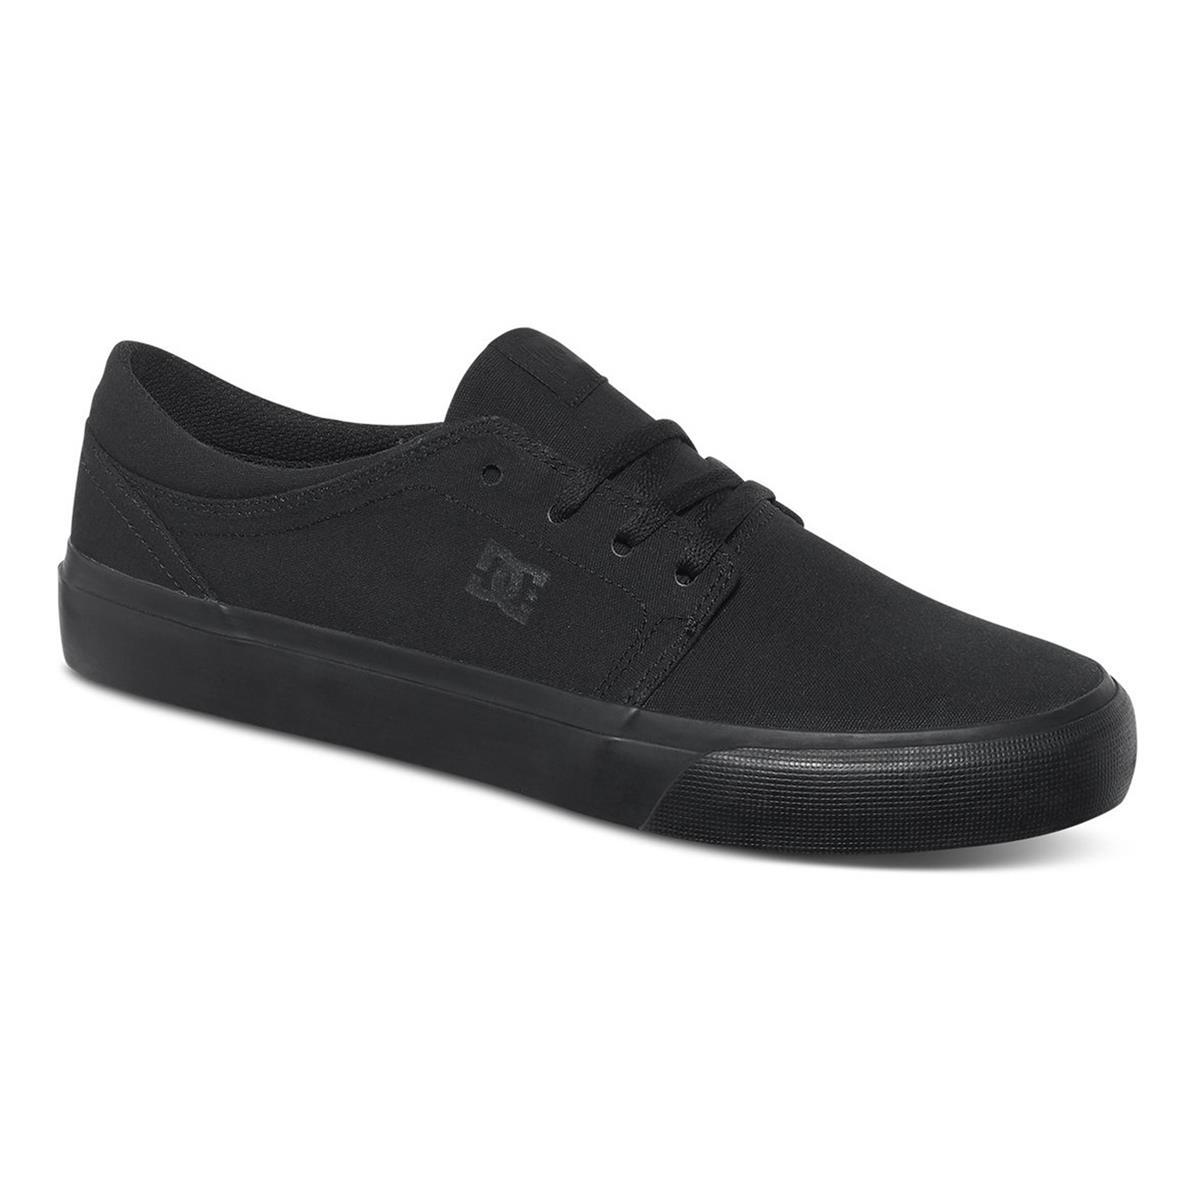 DC Schuhe Trase TX Schwarz